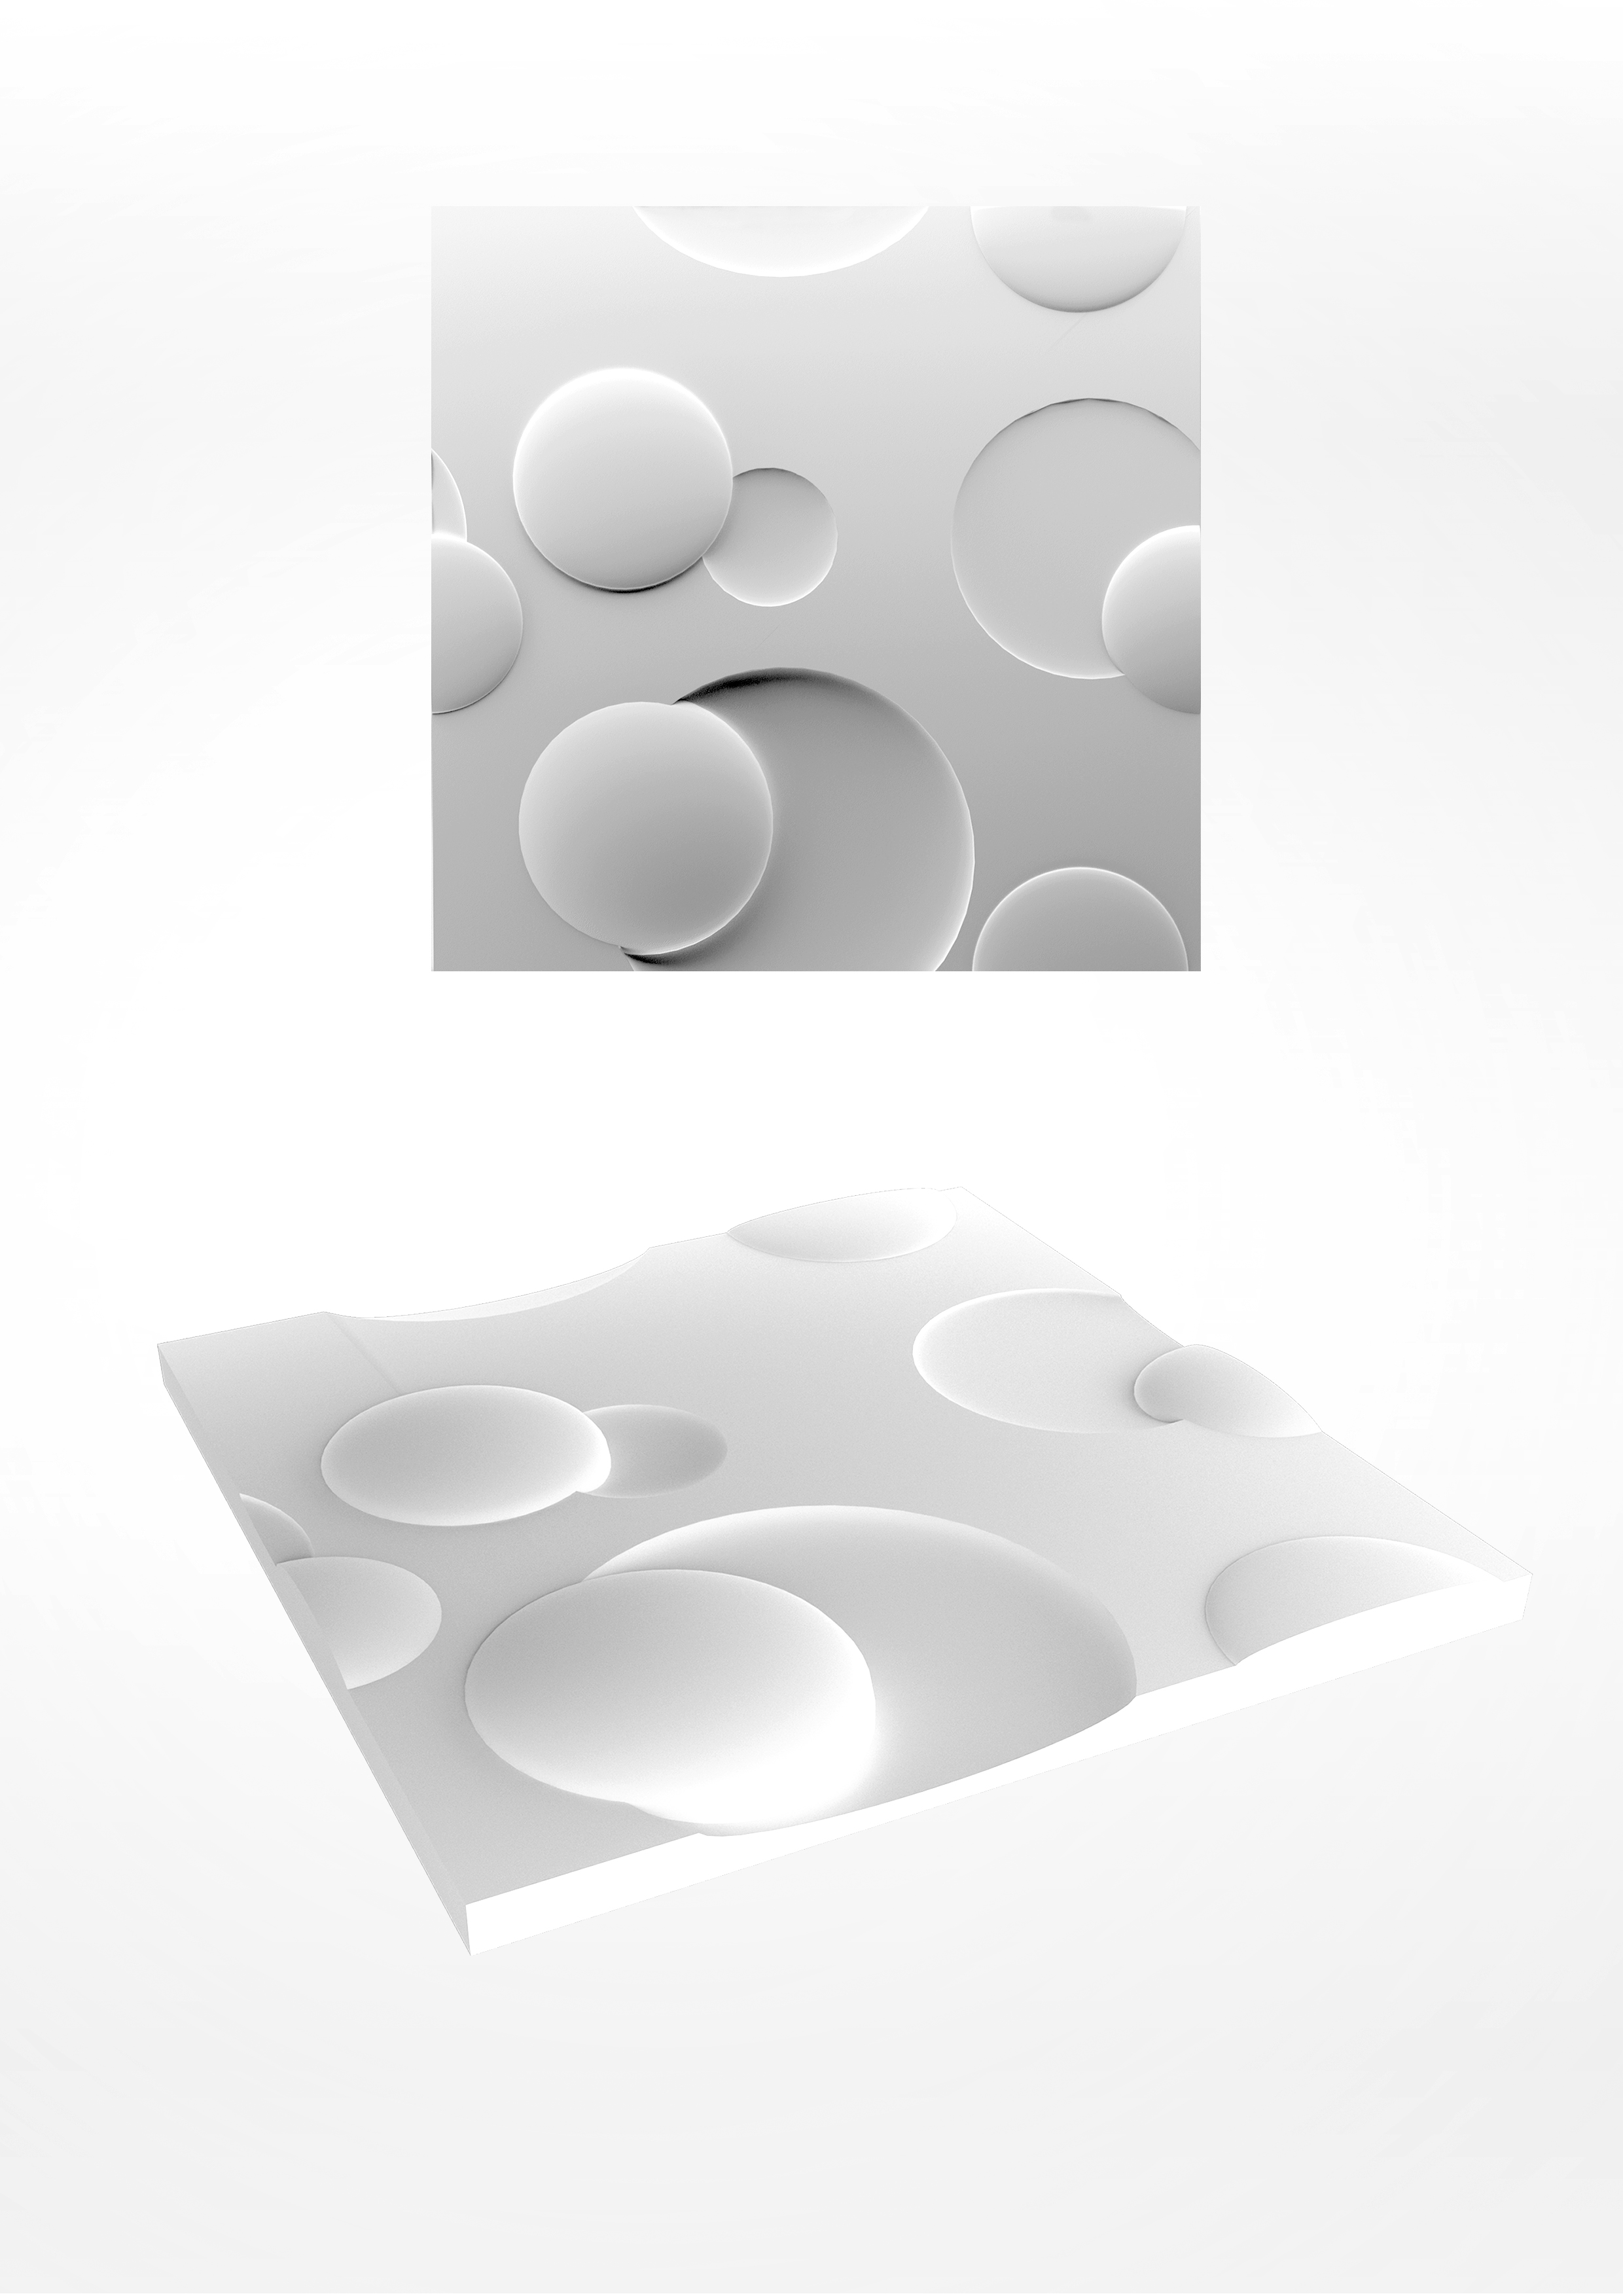 circle 3 d wanpaneele g nstig online kaufen. Black Bedroom Furniture Sets. Home Design Ideas